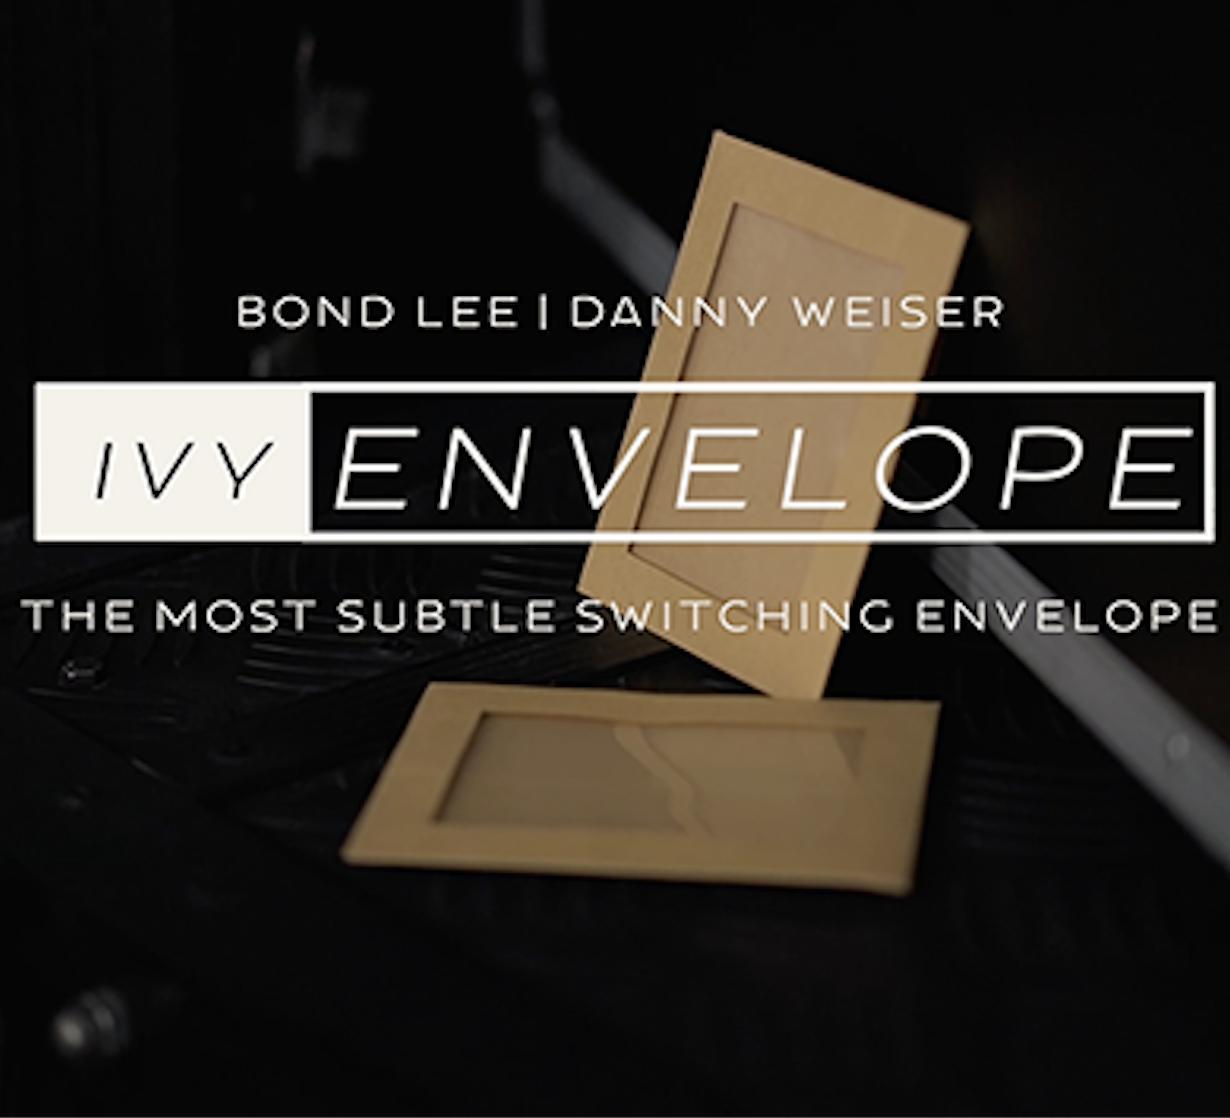 Айви конверт (Gimmicks и онлайн инструкции) от Danny Weiser, Бонд ли как магия, magic show kit, stage магические иллюзии